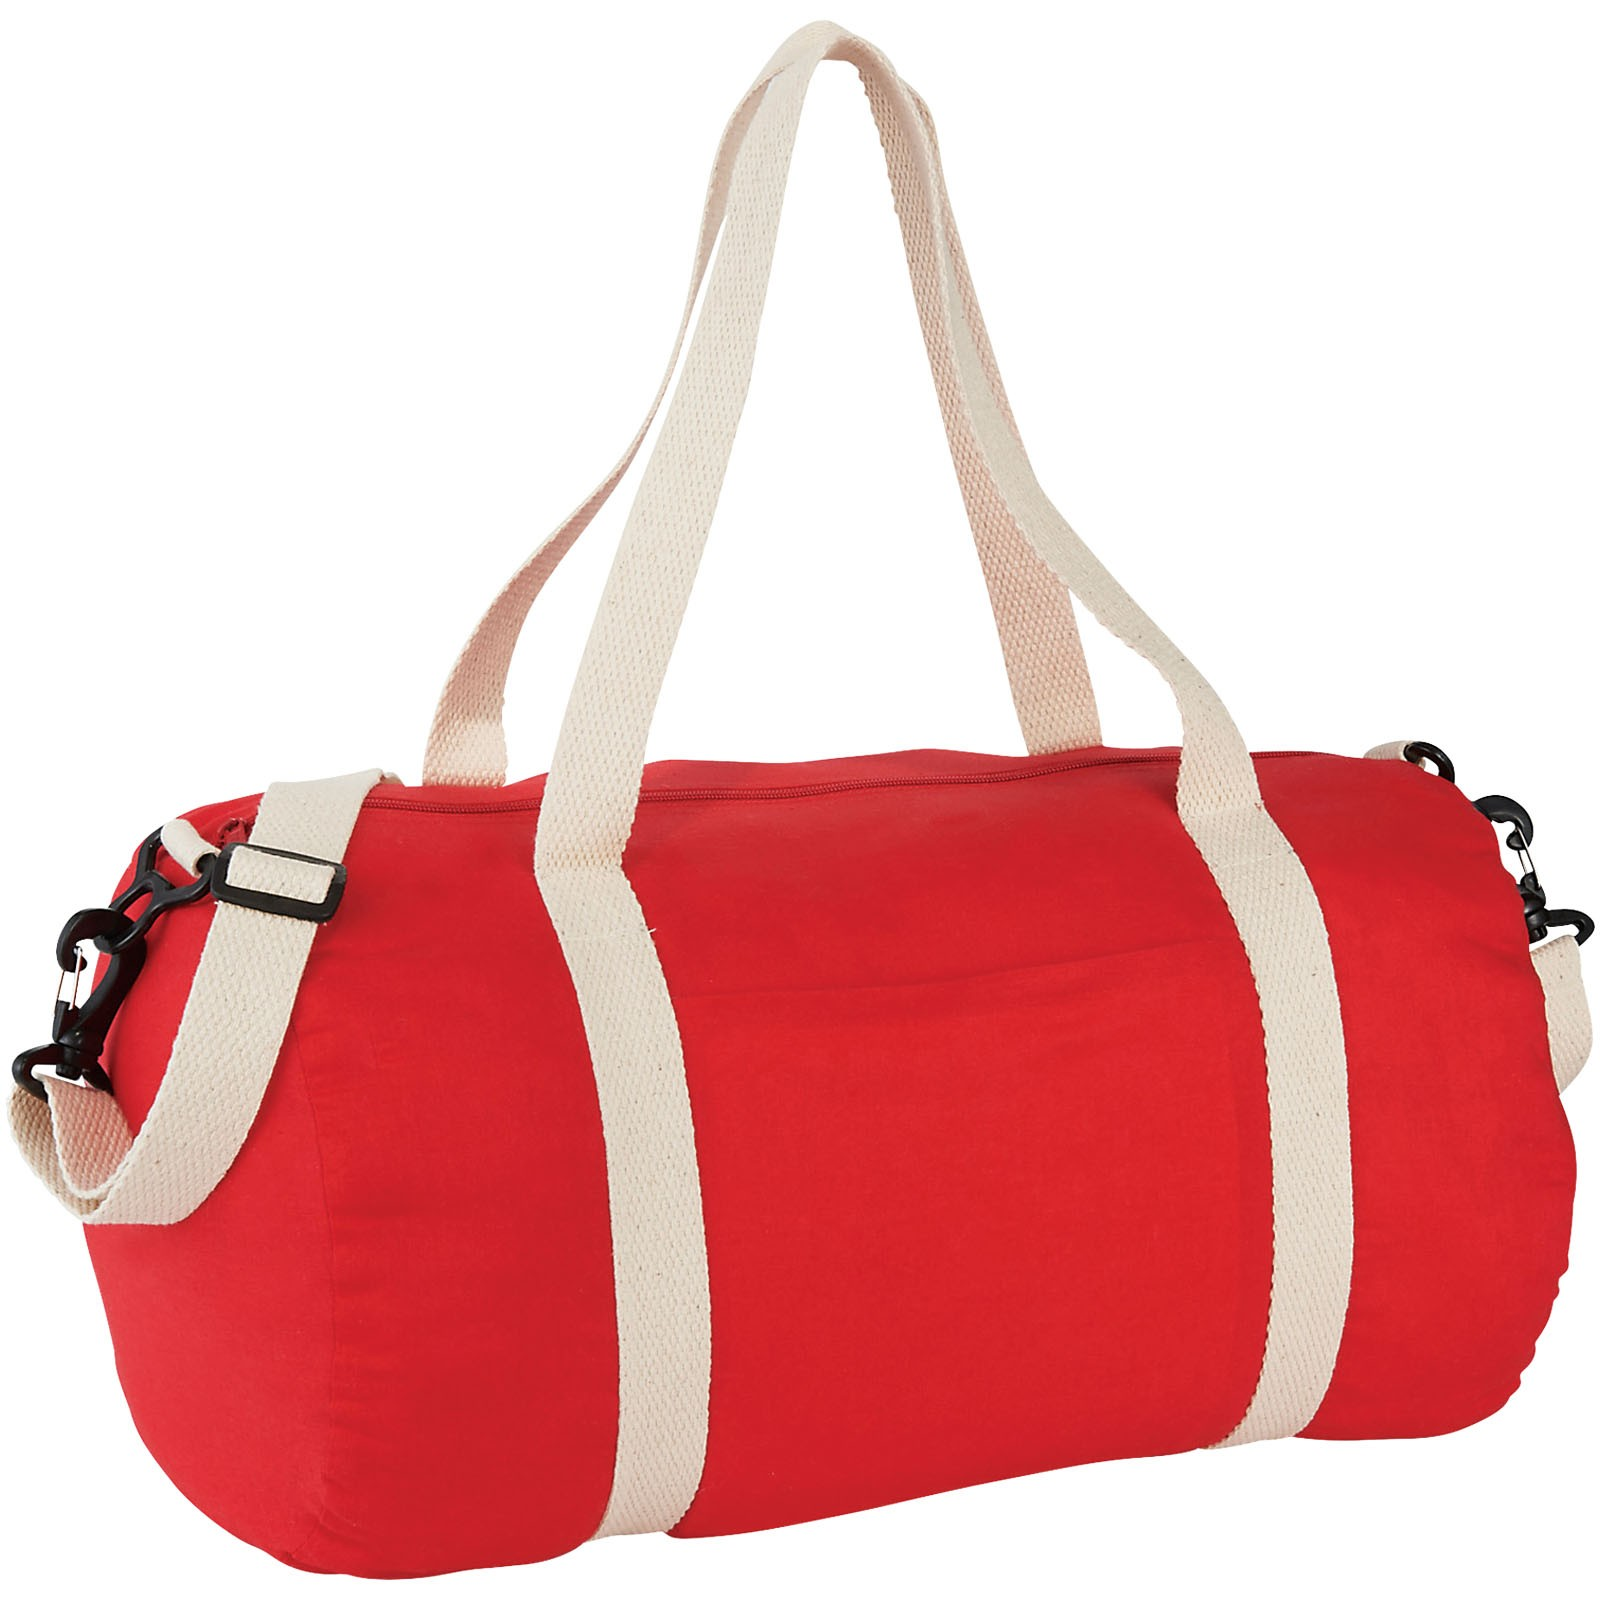 Cochichuate cotton barrel duffel bag - Red